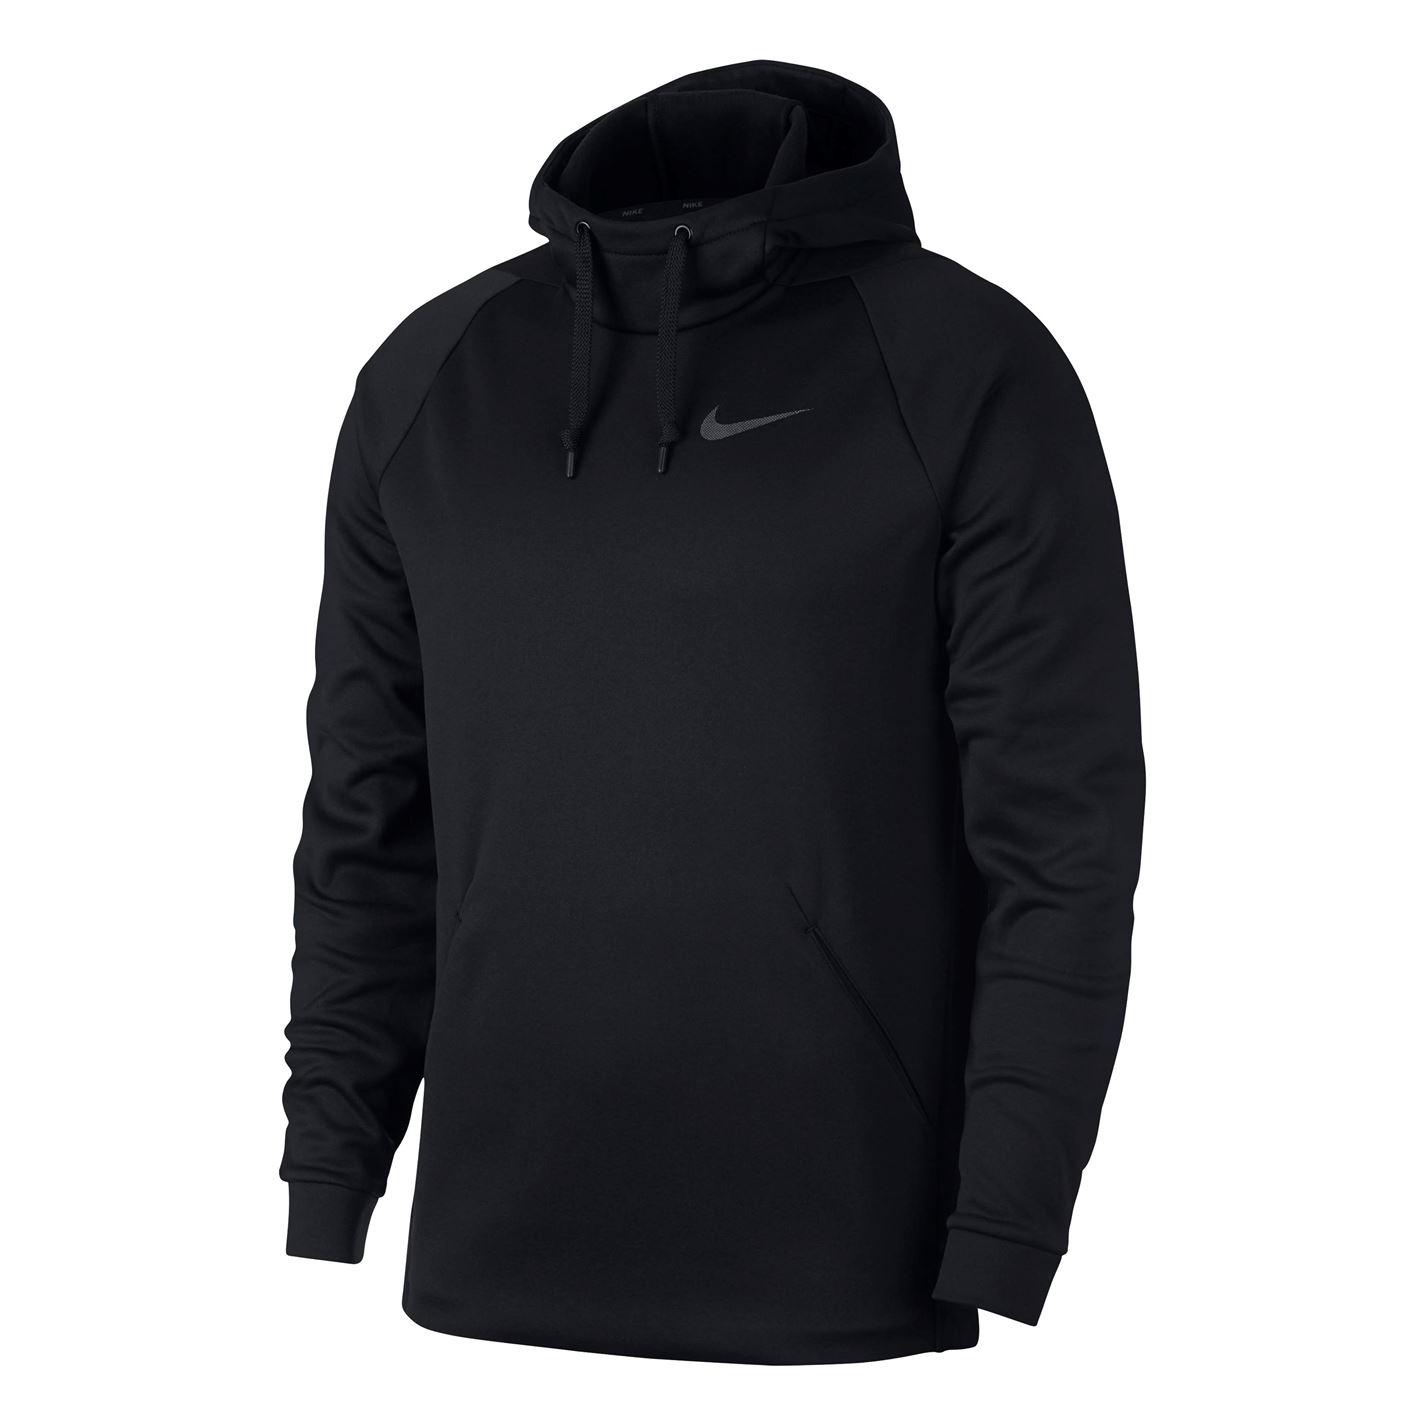 Nike Therma pánská mikina Black - Glami.cz 980bfe8fa5f